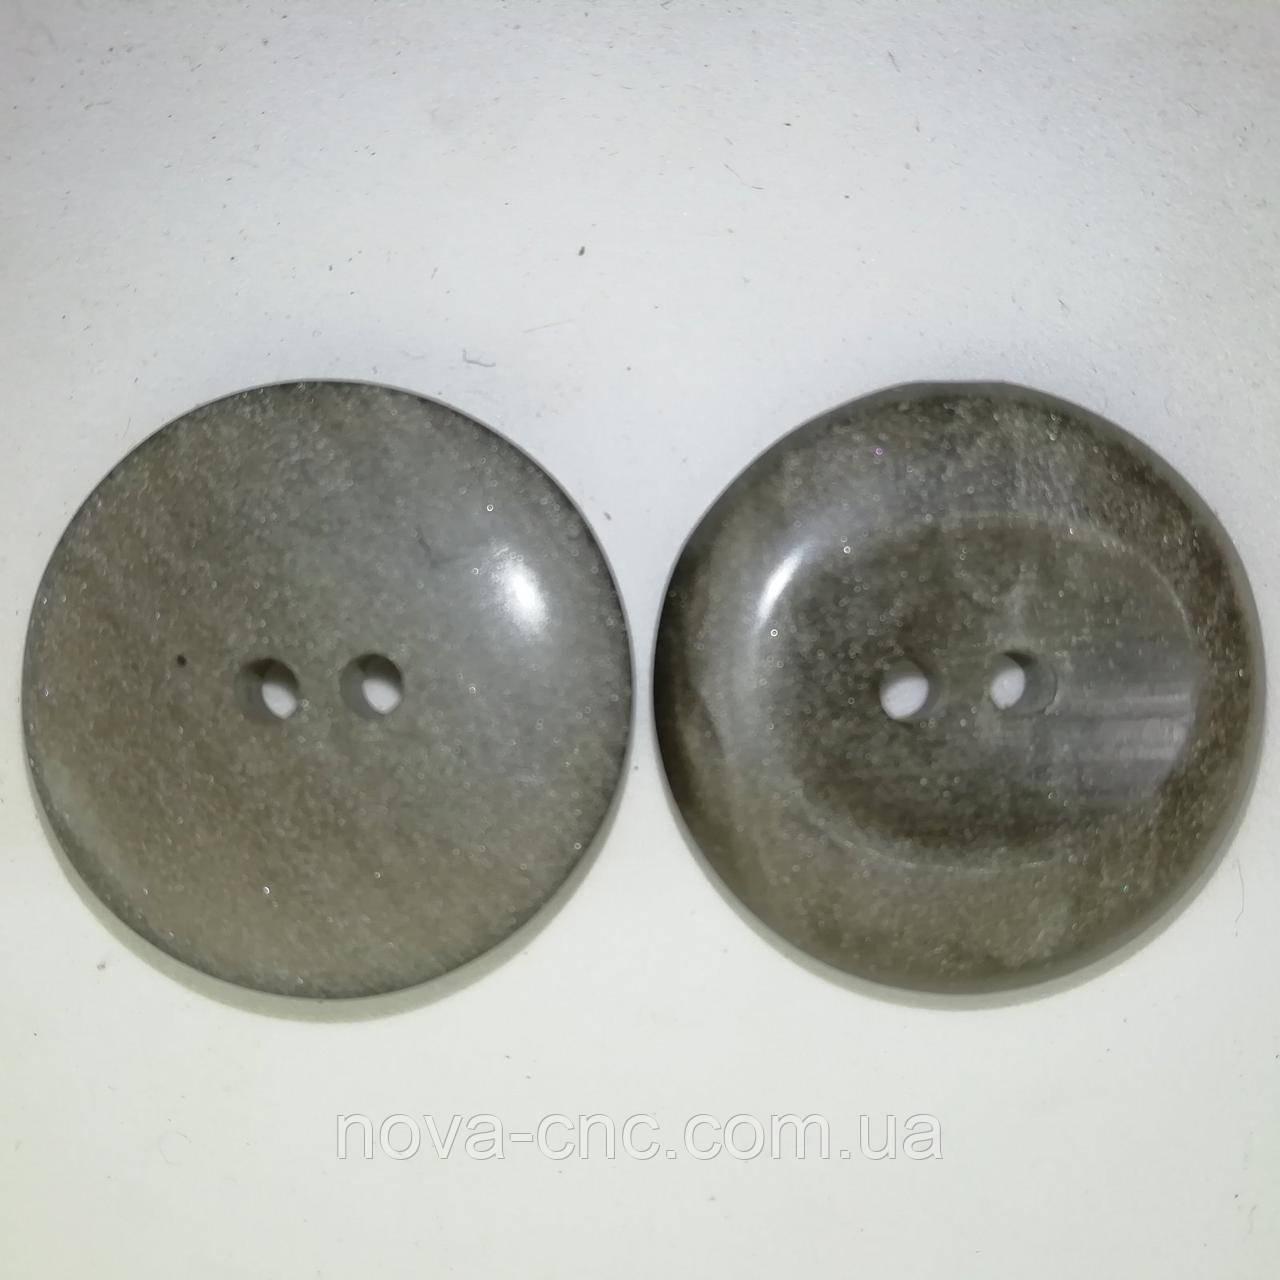 Пуговицы  пластмассовые 26 мм Цвет серый мрамор Упаковка 550 штук